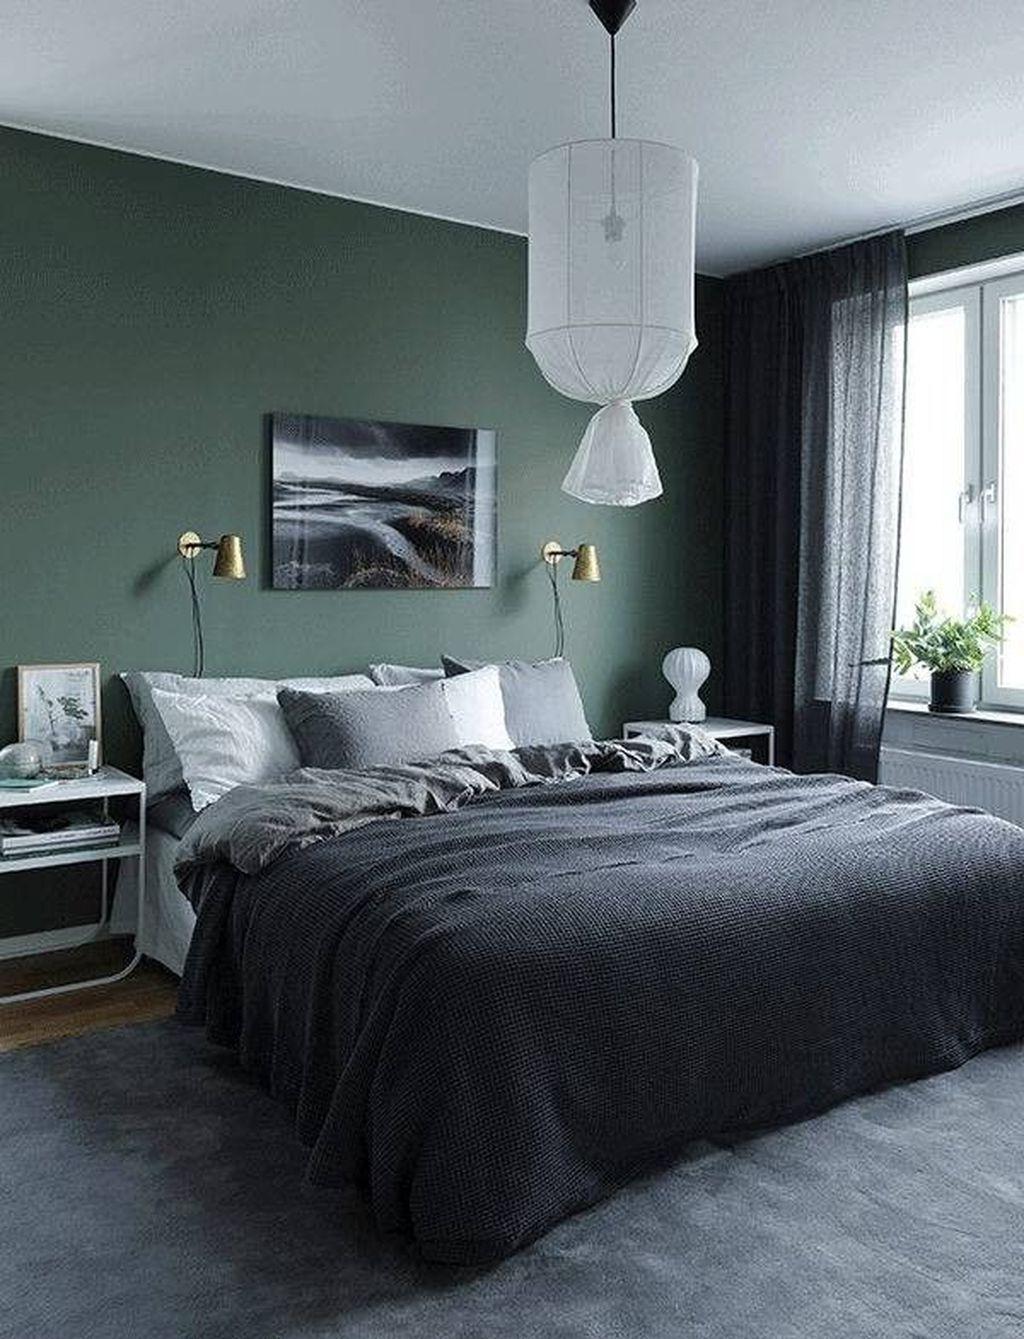 Decorating Men's Bedrooms - Decor Around The World in 2020 ...